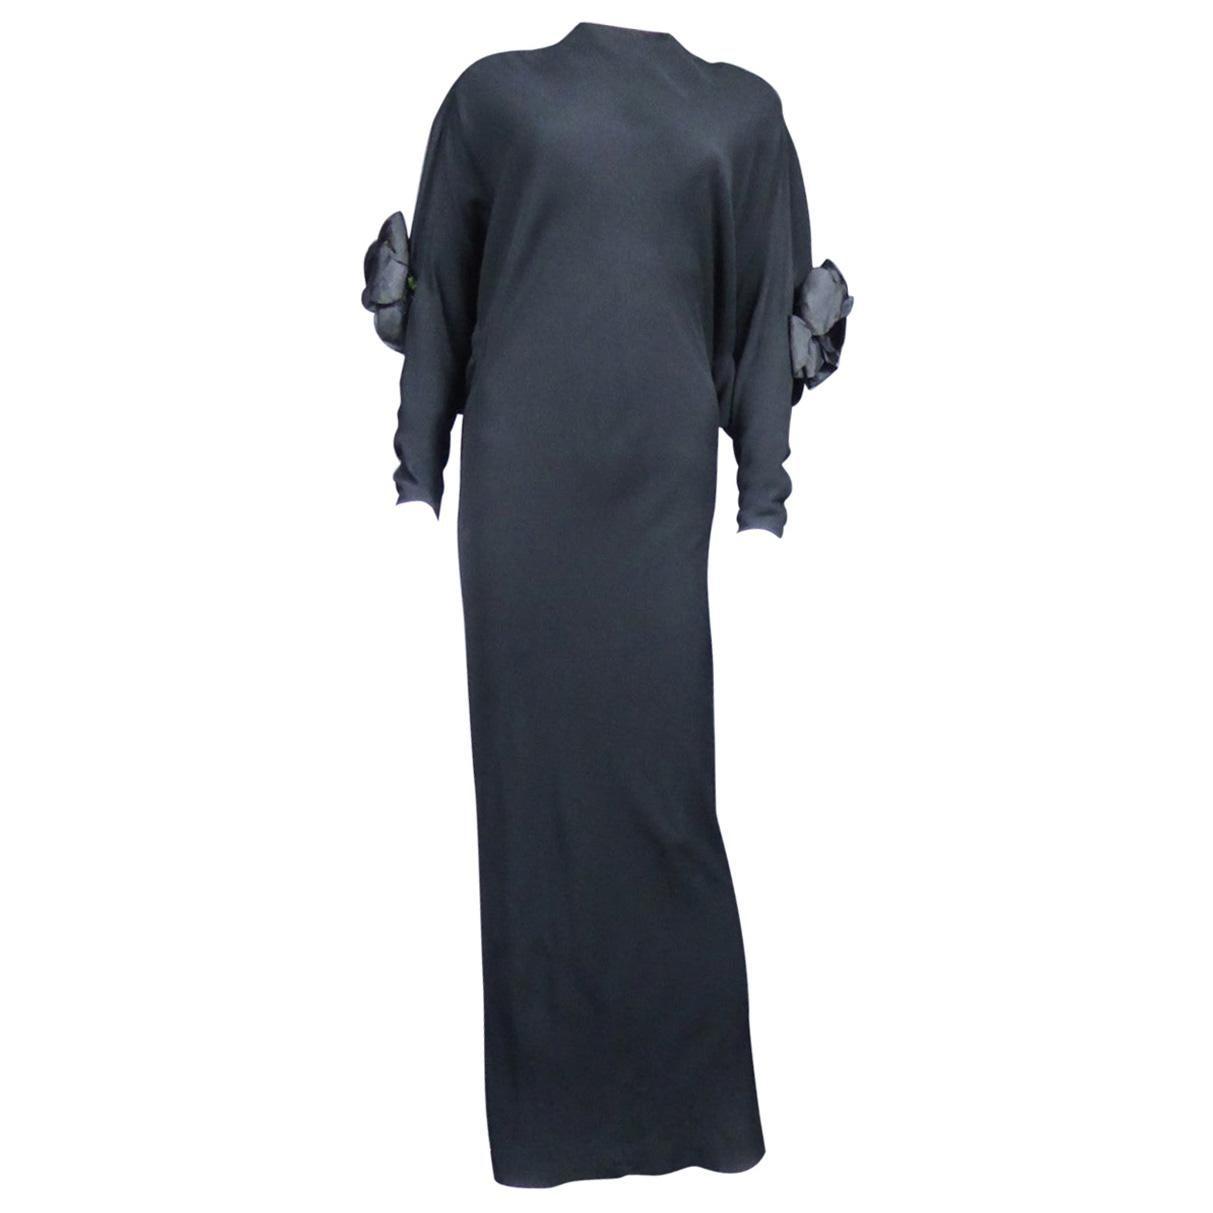 A Pierre Cardin Black Couture Jersey Evening Dress Circa 1976/1978